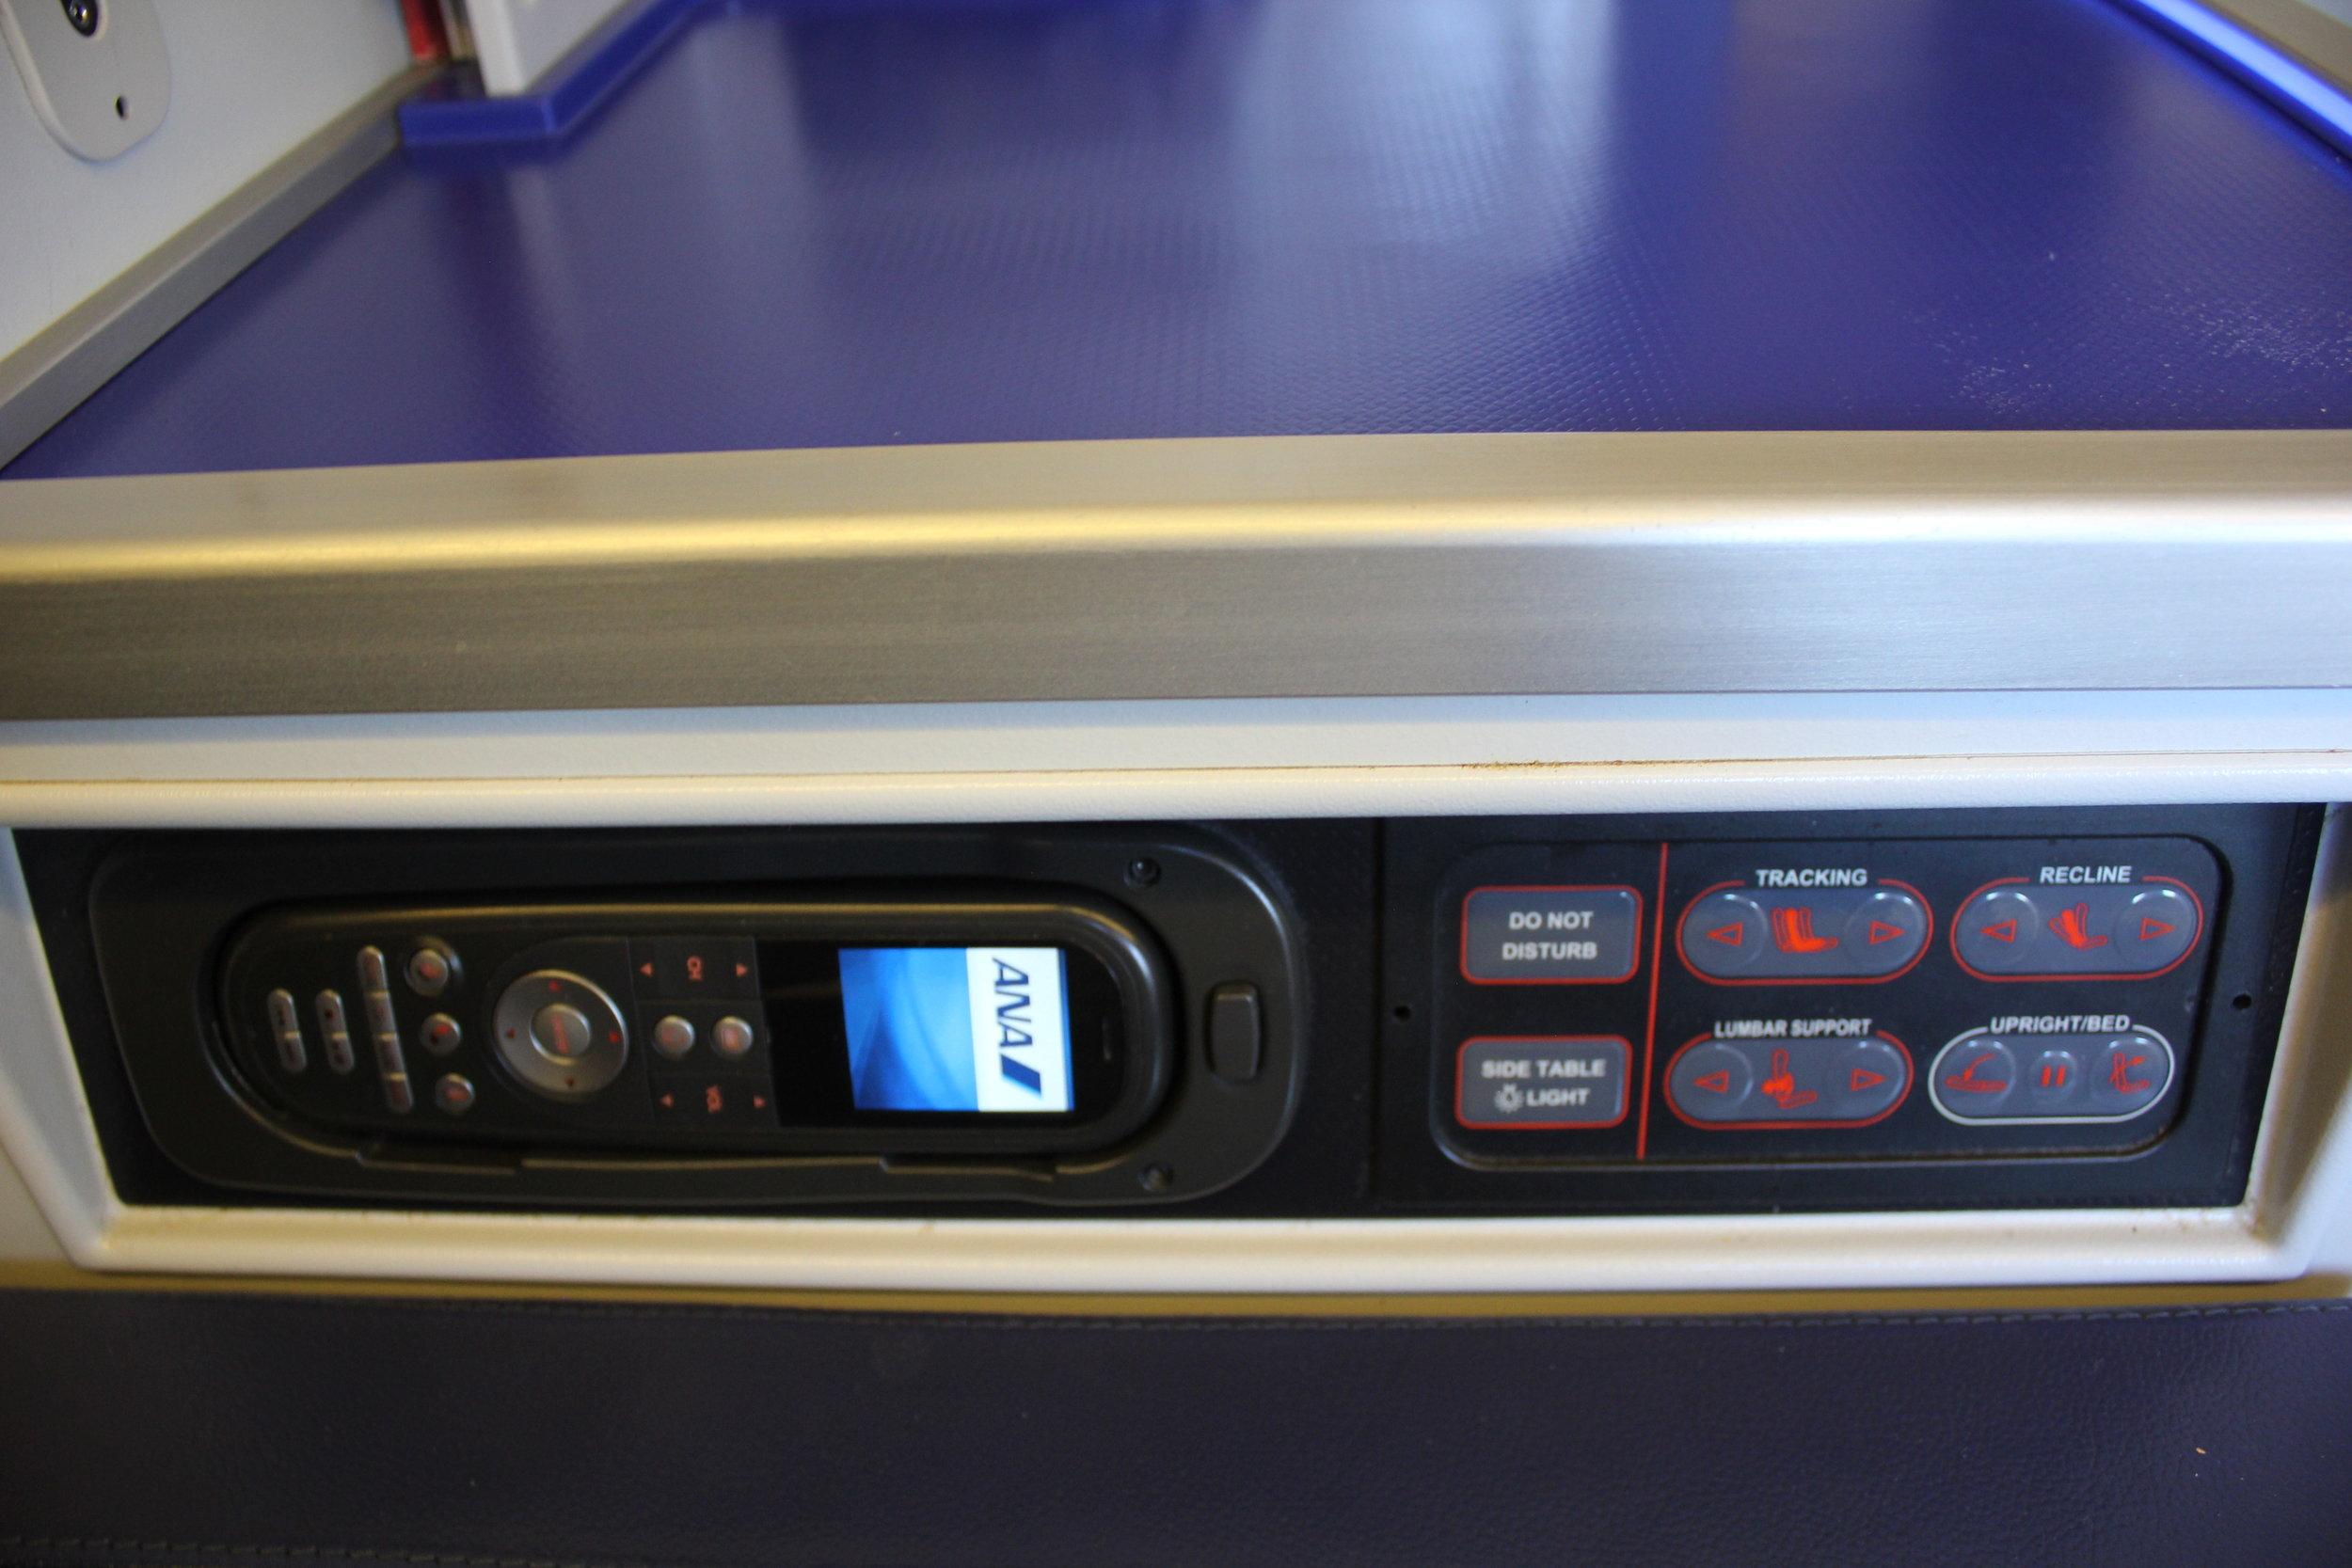 ANA 777 business class – Control panel